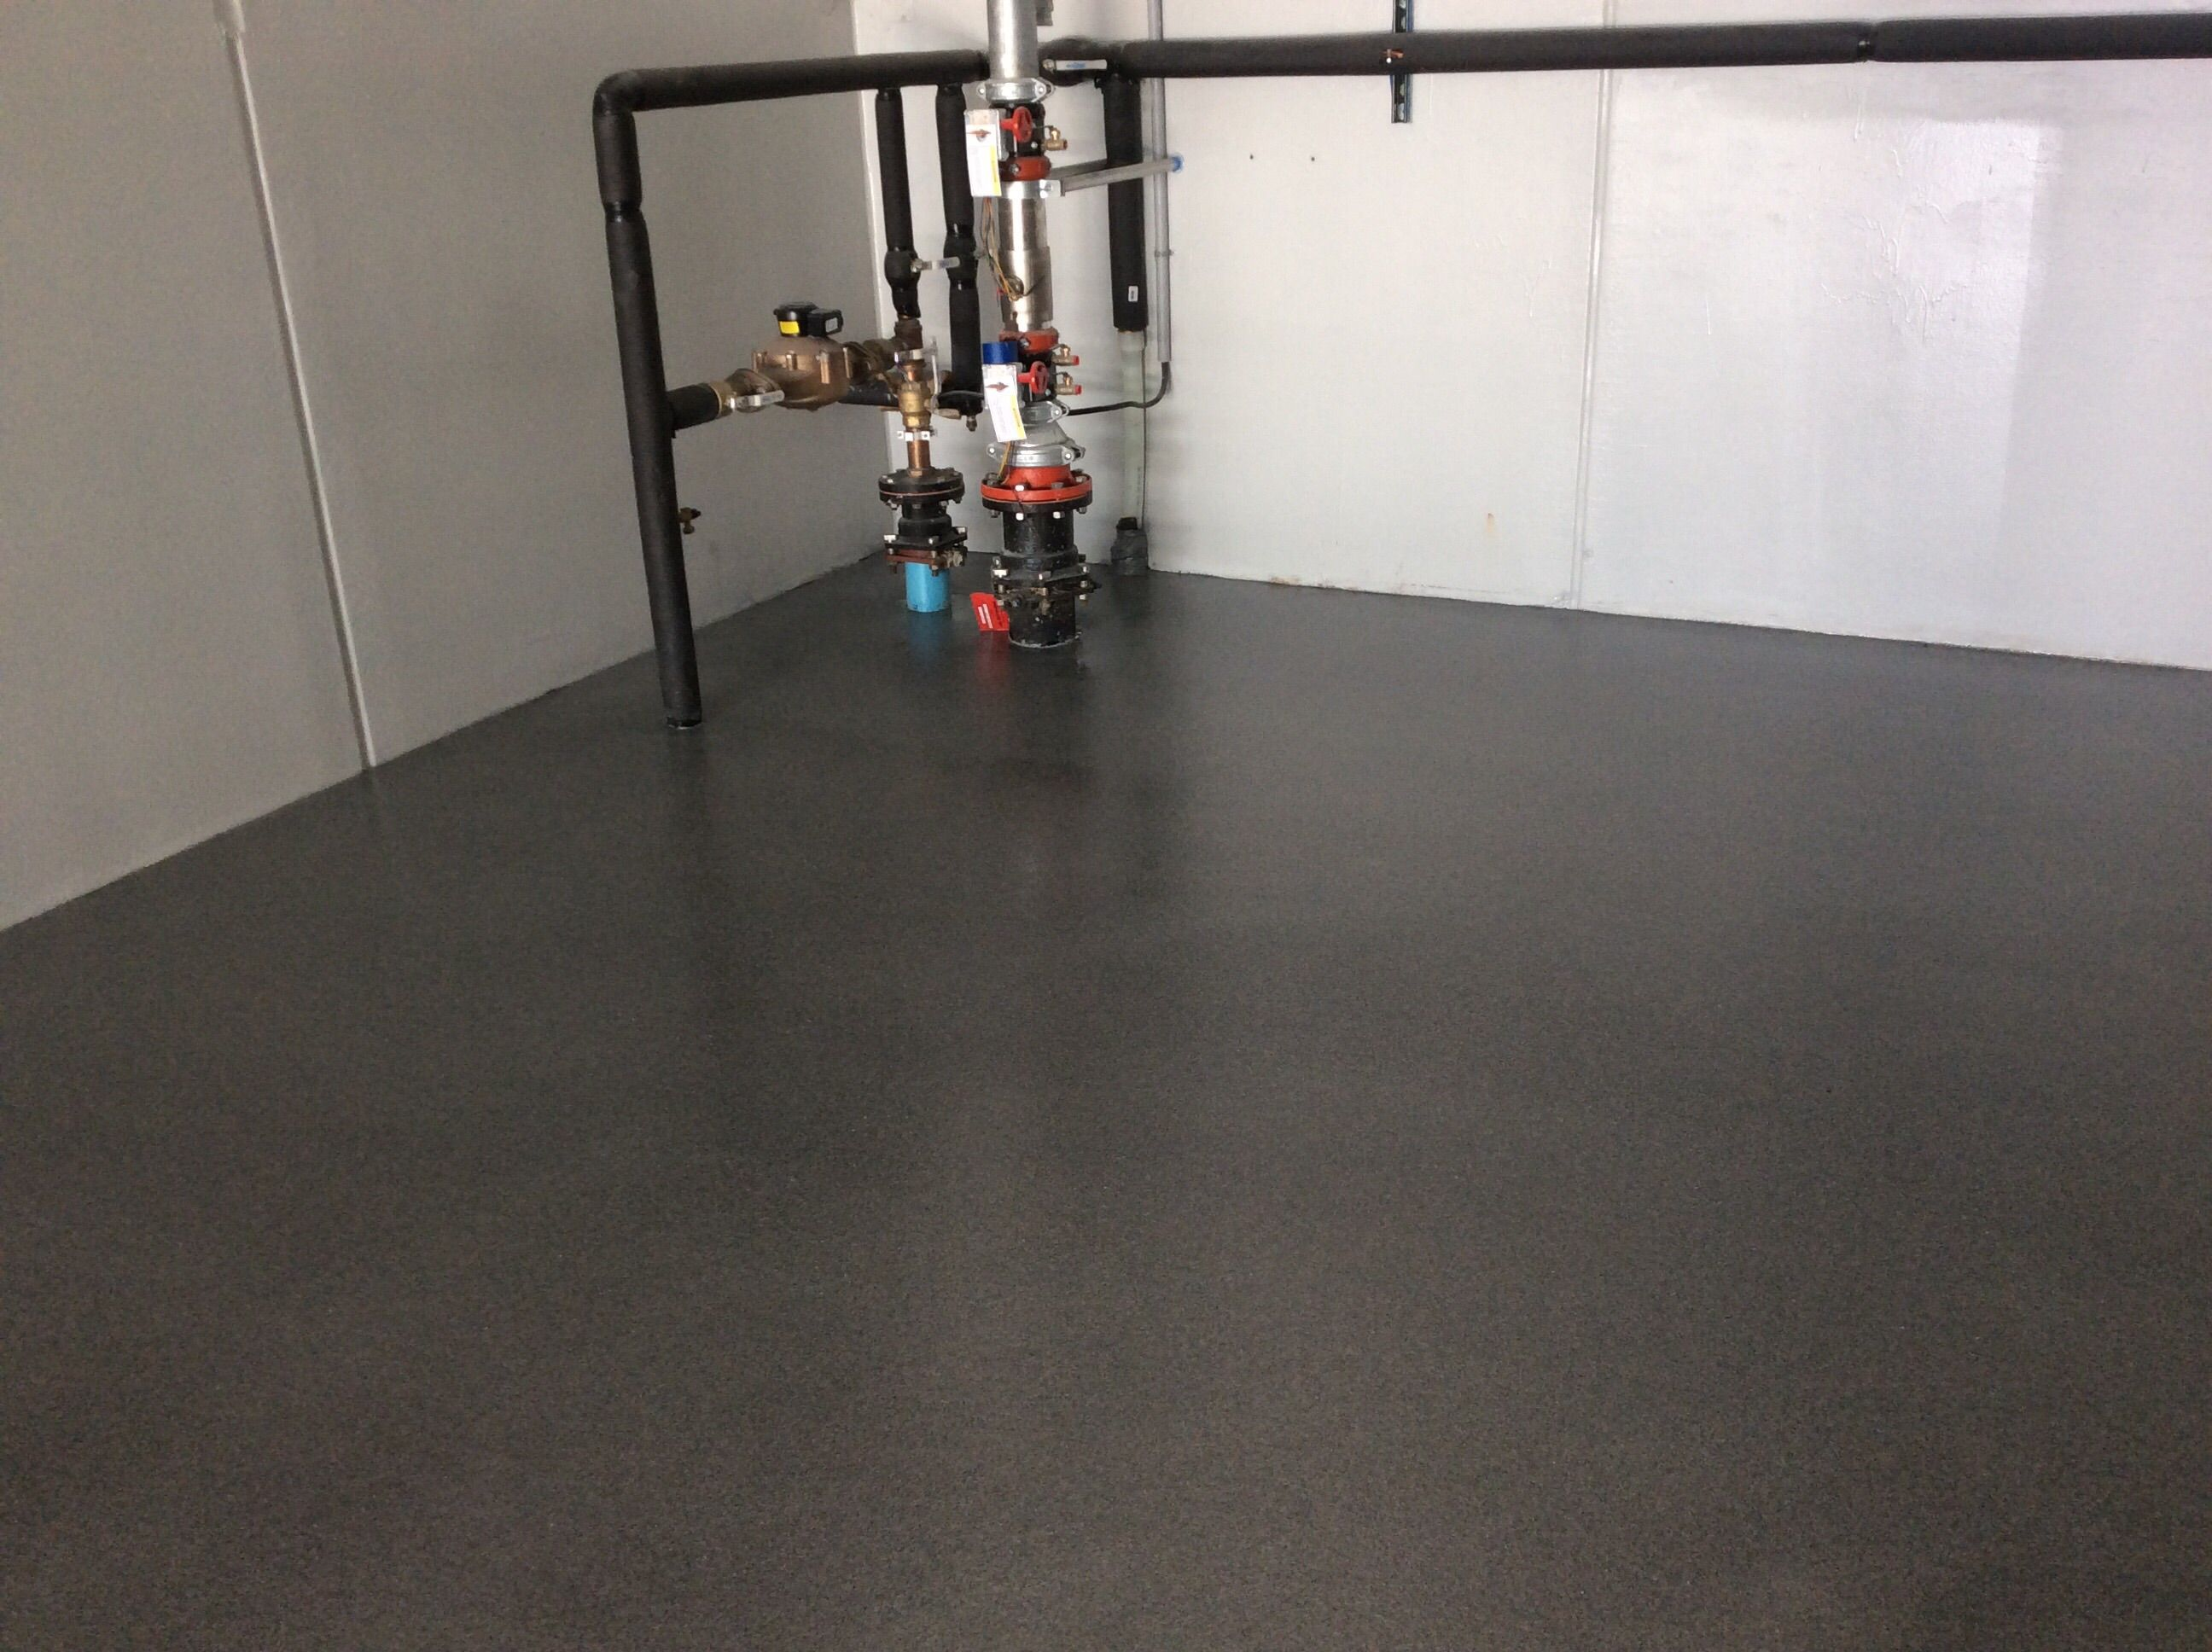 Ppg Megaseal Sl 100 Solids Epoxy With Ppg Amershield Urethane Topcoat Hp Spartacote Flint Quartz Cool House Designs Garage Floor Epoxy Garage Floor Coatings